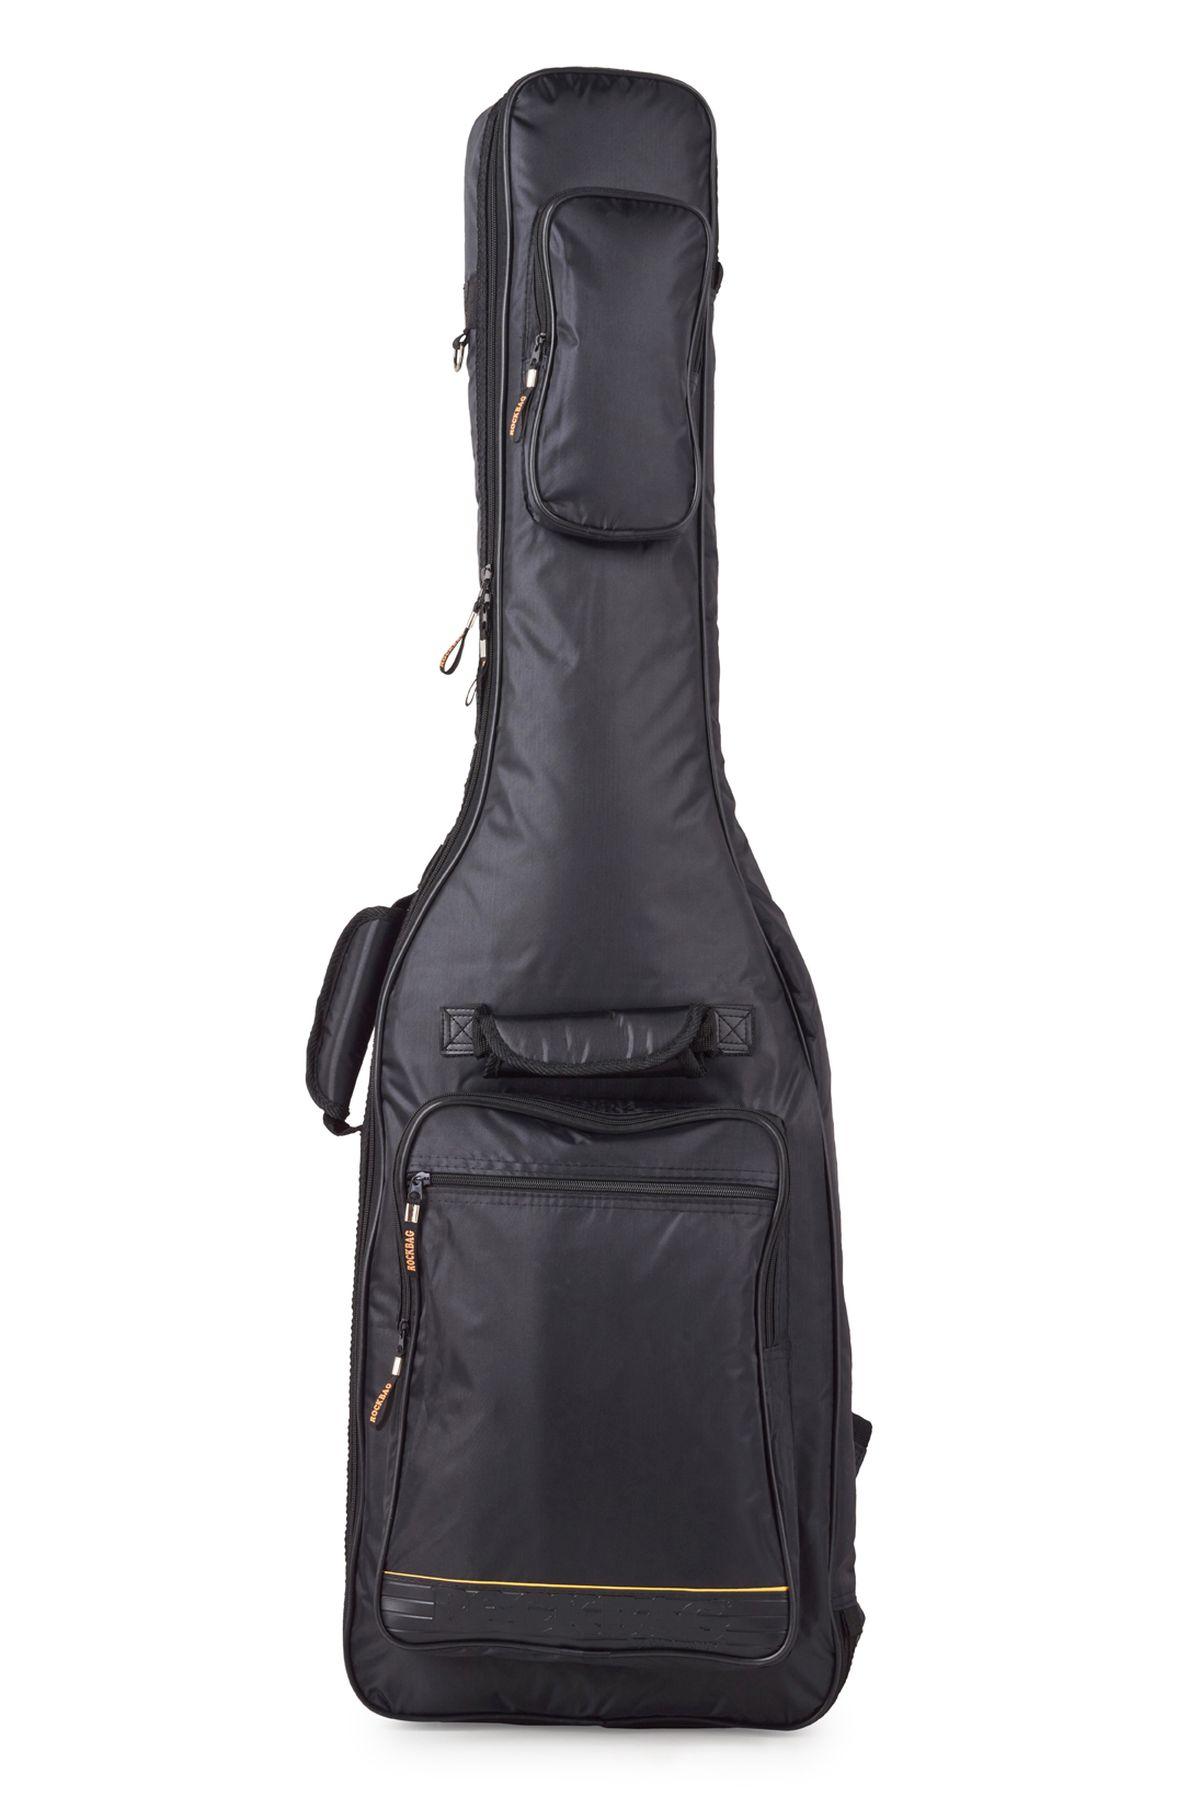 RockBag RB 20505 B Bass